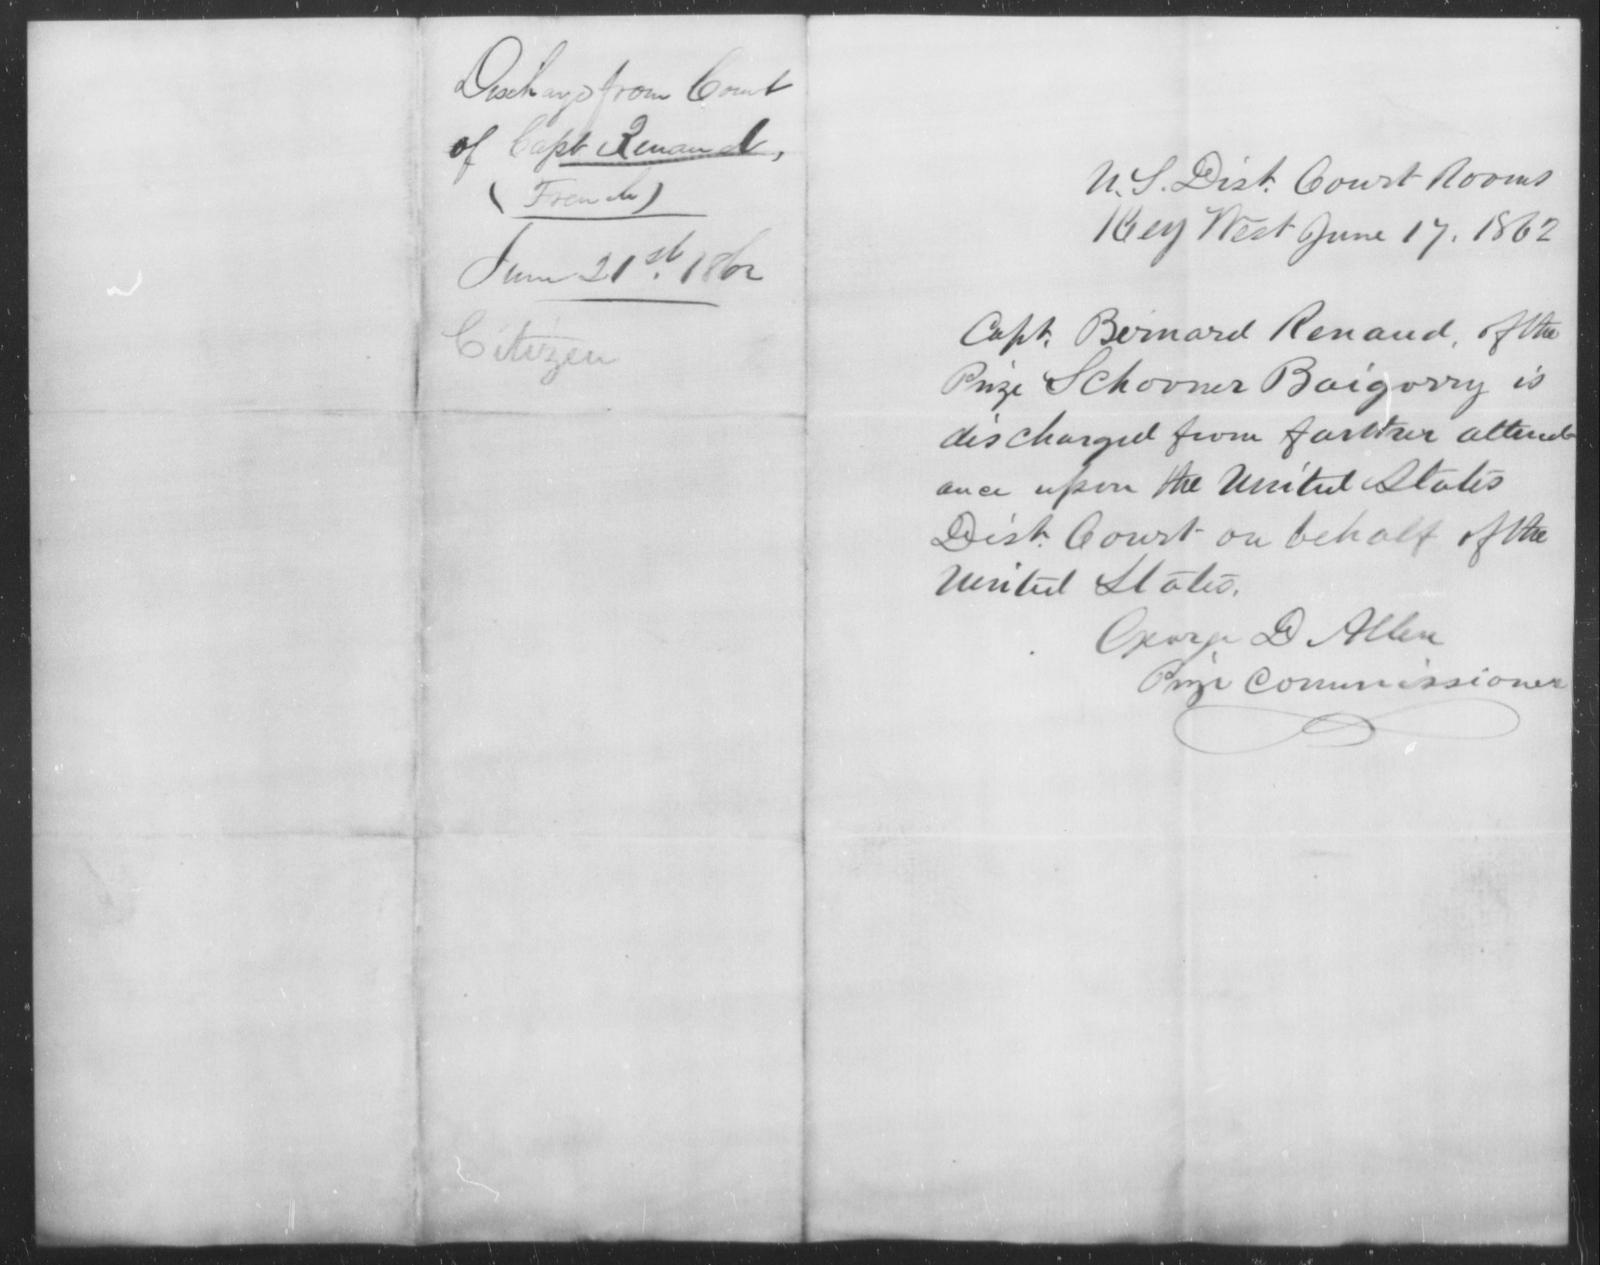 Renaud, Bernard - State: [Blank] - Year: 1862